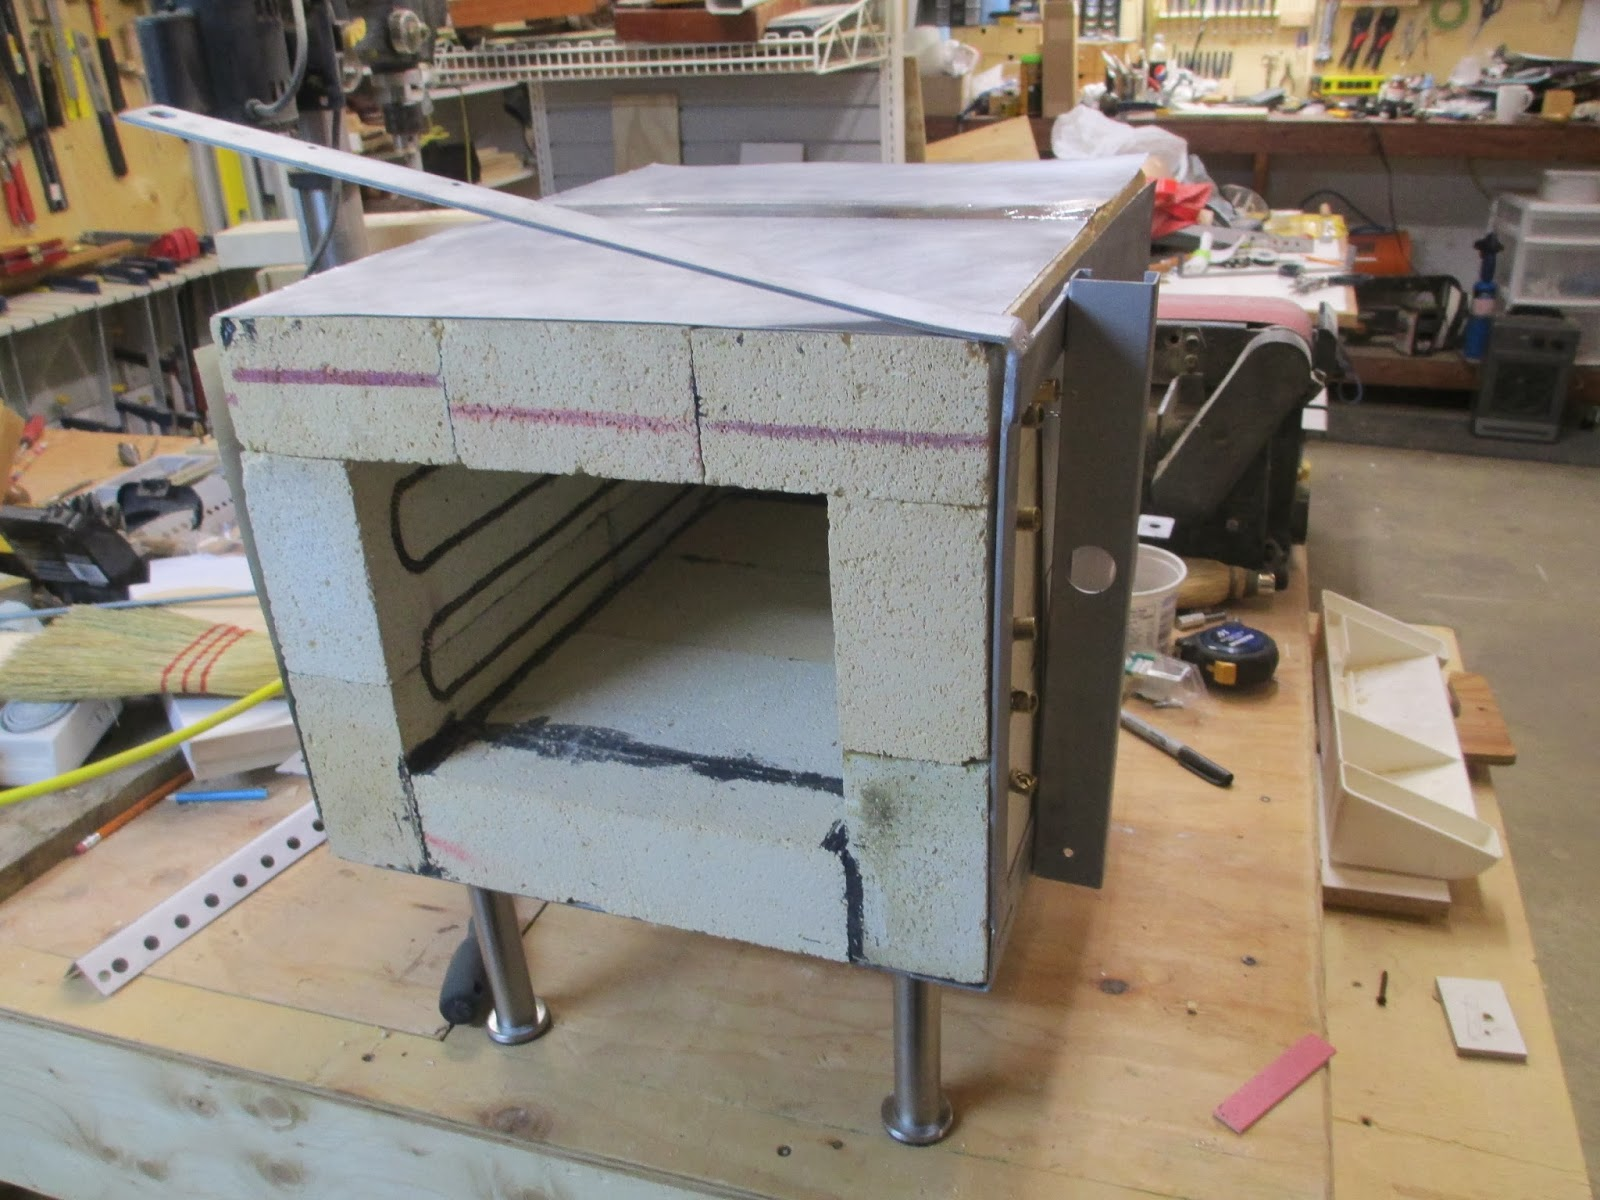 Diy Knifemaker S Info Center Heat Treatment Oven Project